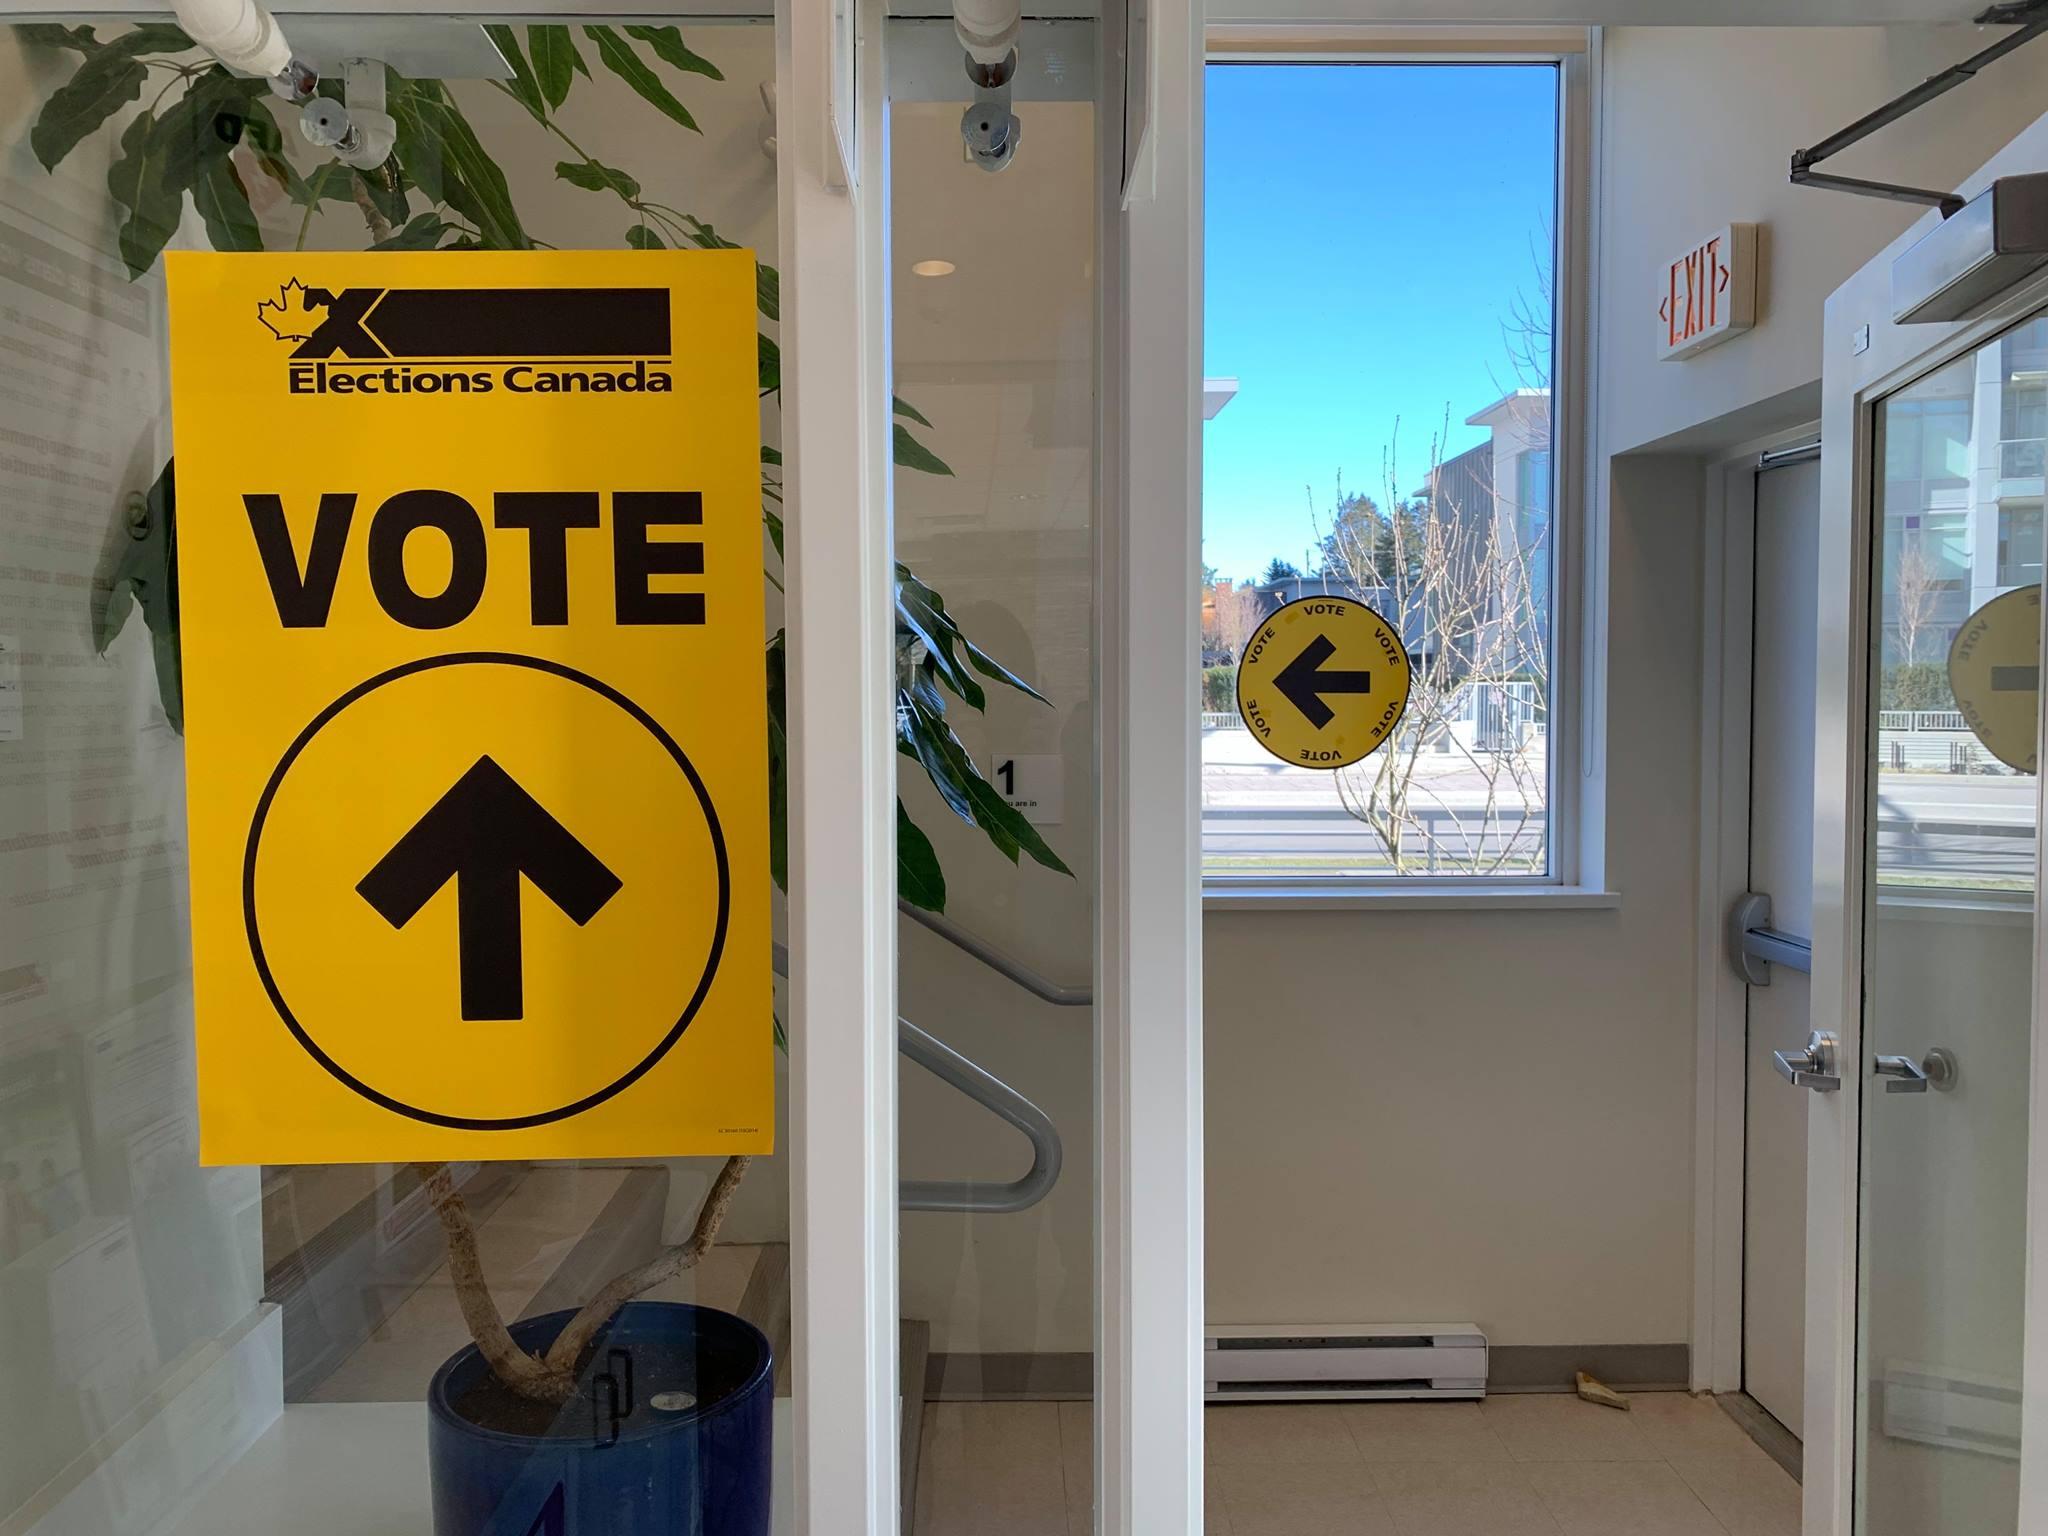 Advance polls show more Guelphites cast ballots over 2015 election